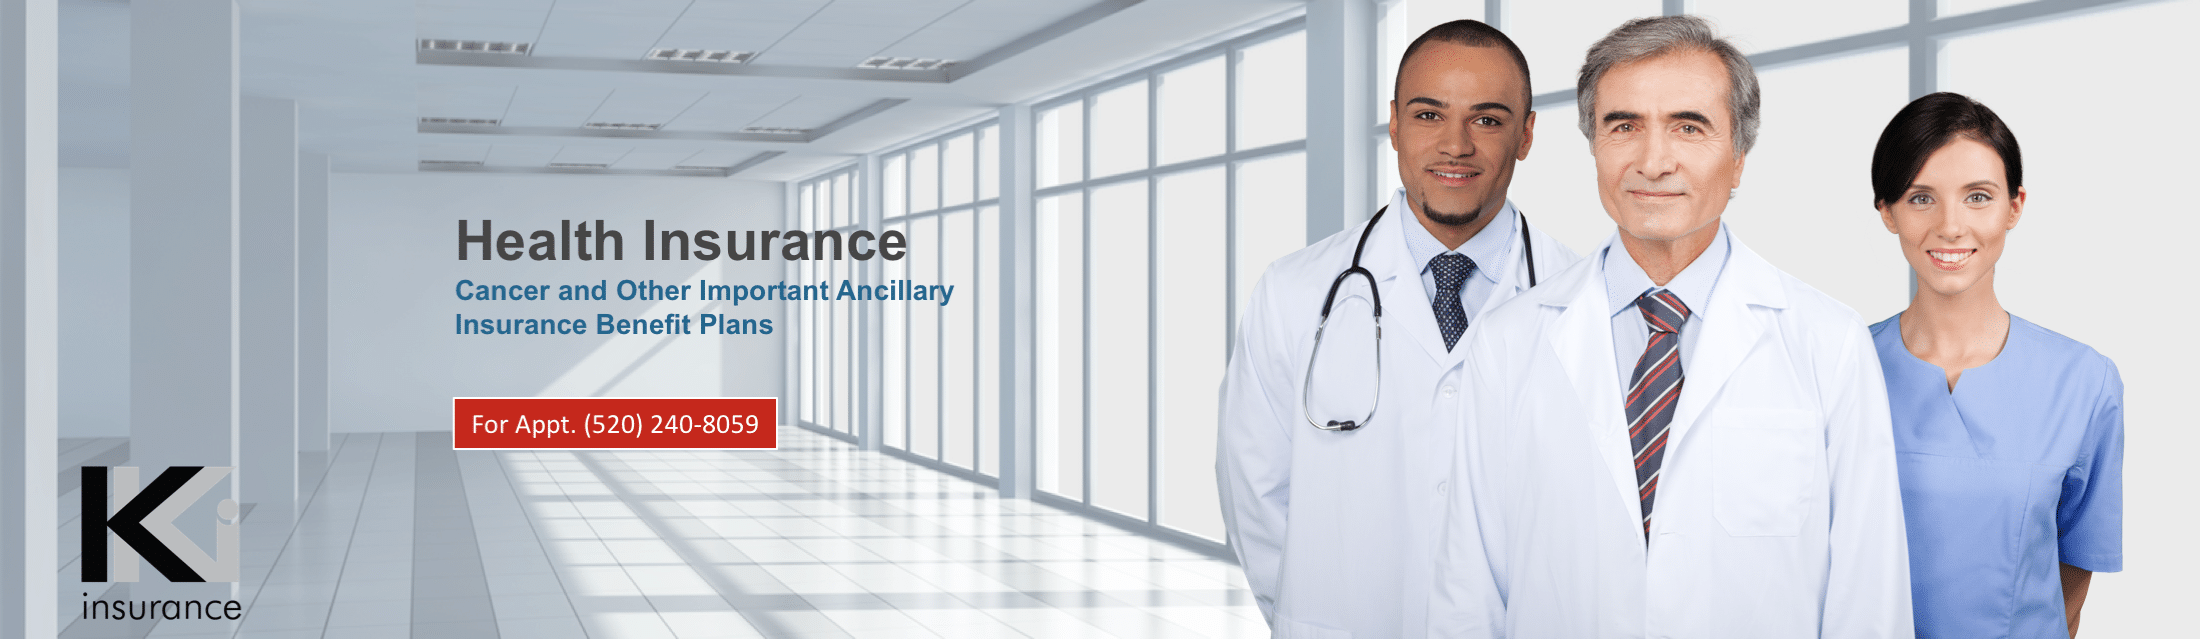 https://kimkraftinsurance.com/wp-content/uploads/2017/02/Arizona-Health-Insurance-Cancer-Insurance-Kim-Kraft-Insurance.png